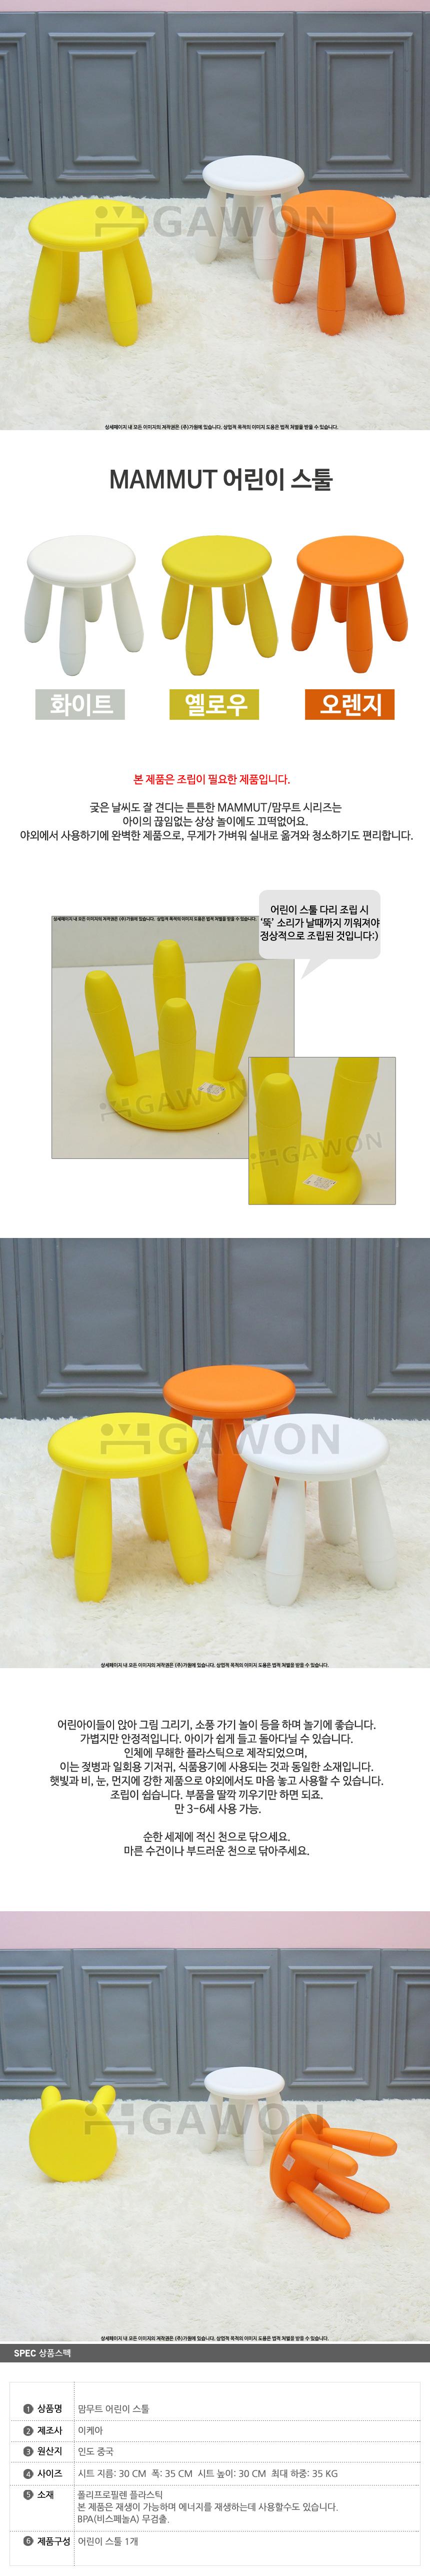 MAMMUT 어린이 스툴 - 이케아, 13,300원, 가구, 의자